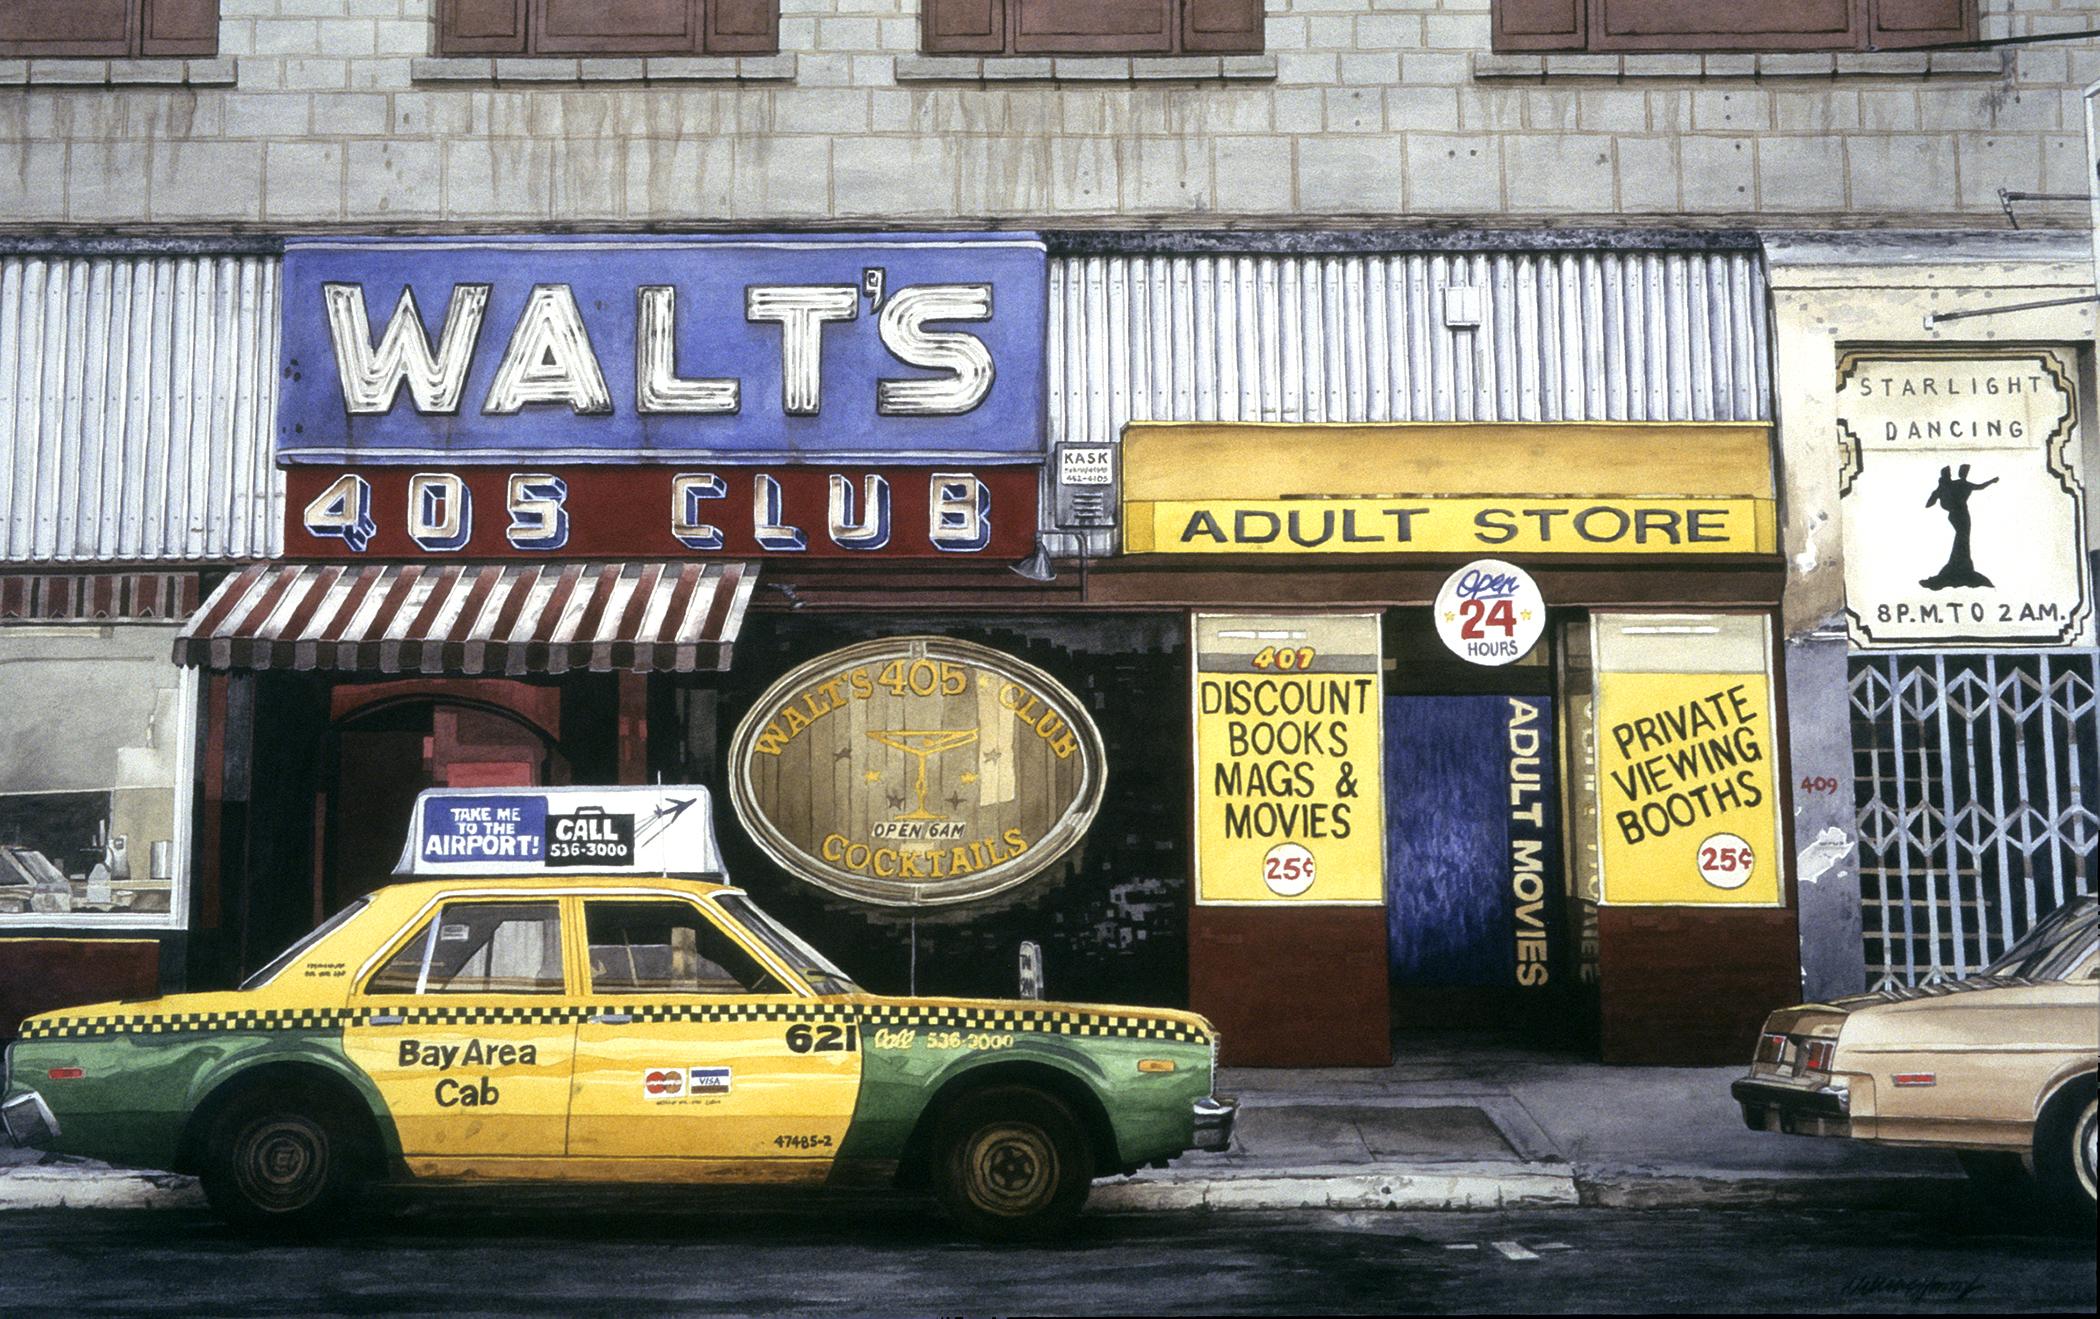 W_Walts_33x48.jpg